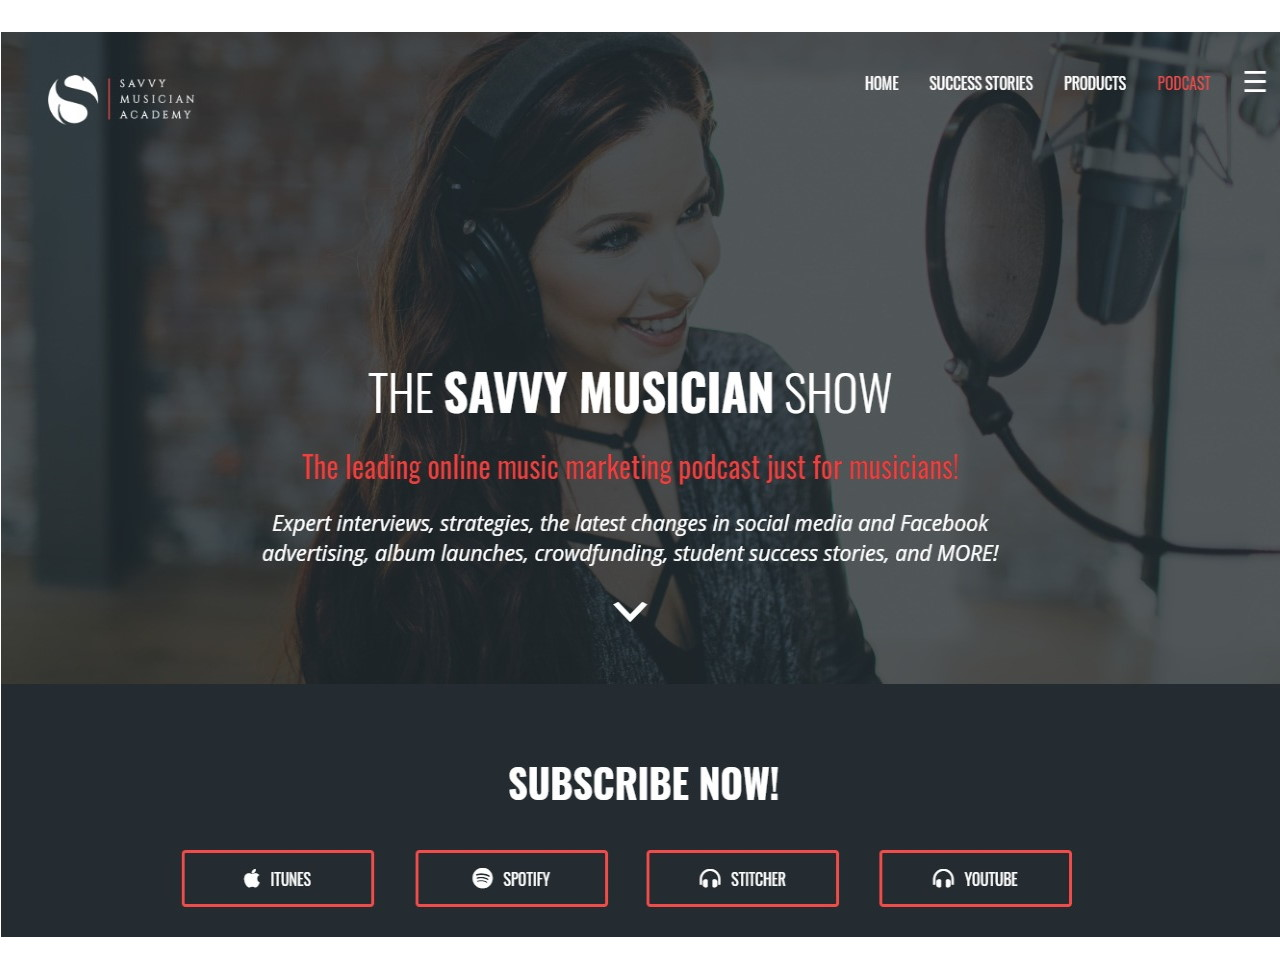 New Podcast Savvy Musician Academy